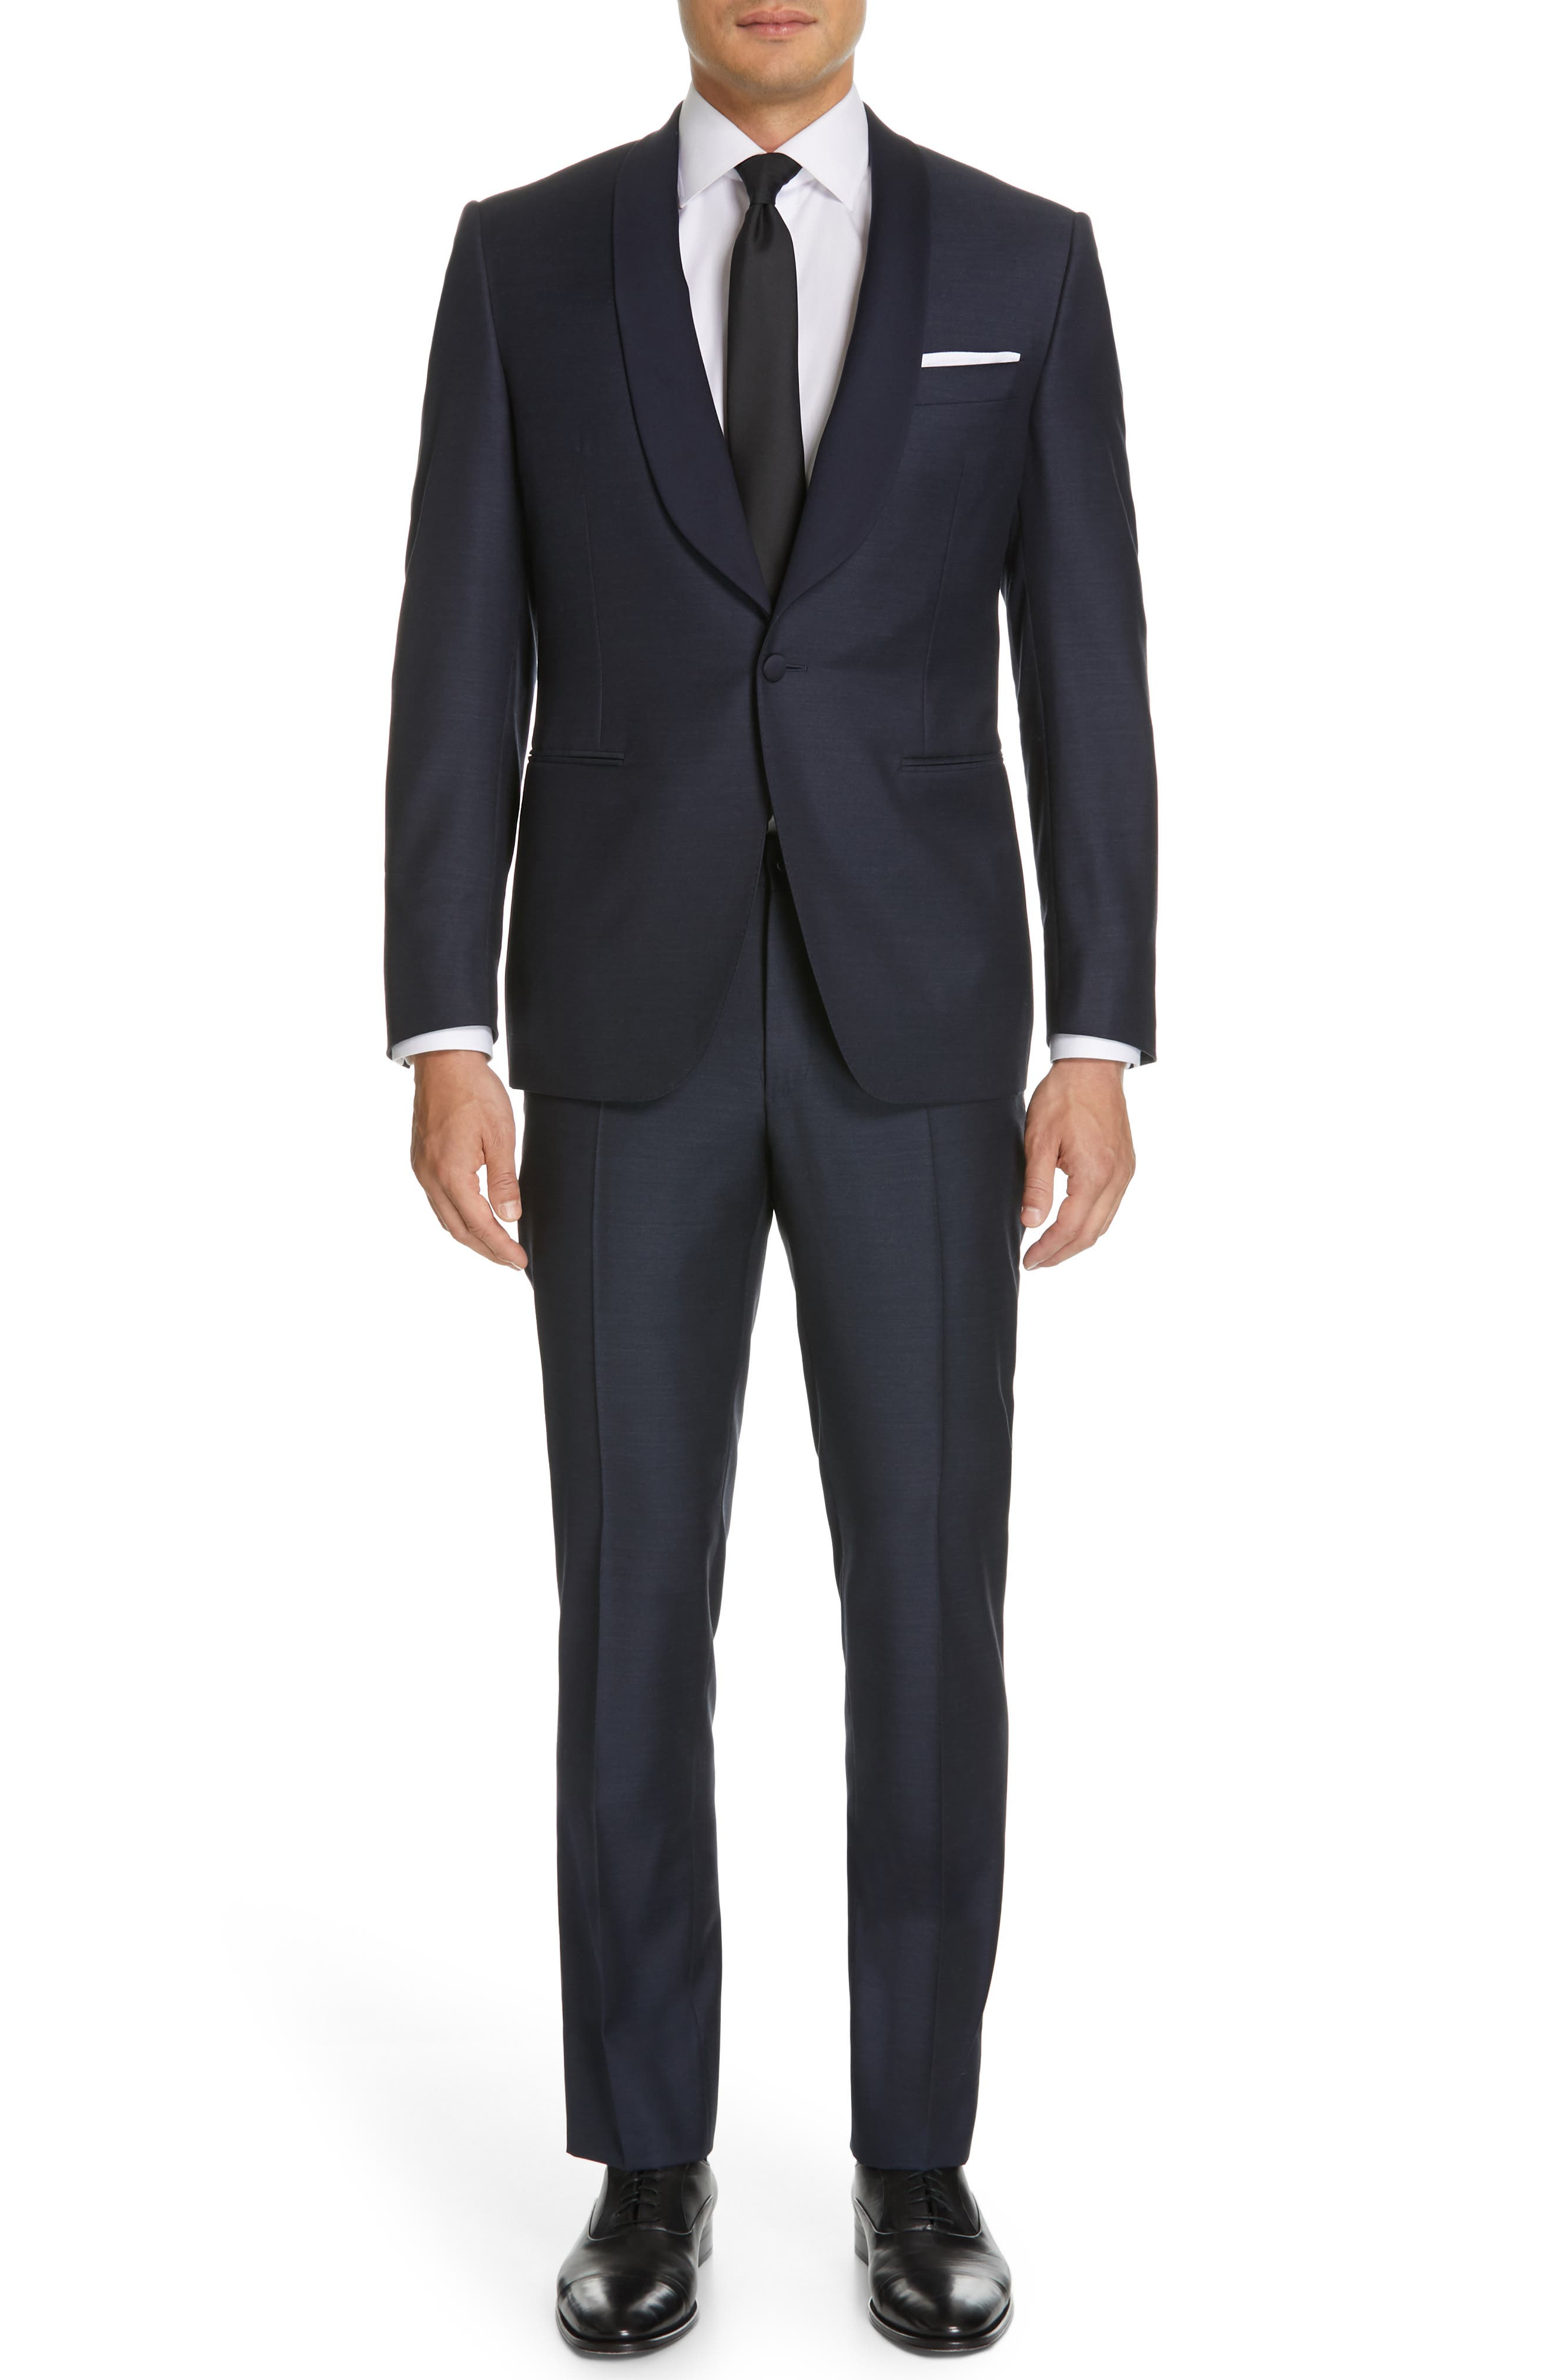 CANALI, Venieza Classic Fit Wool Tuxedo, Main thumbnail 1, color, NAVY